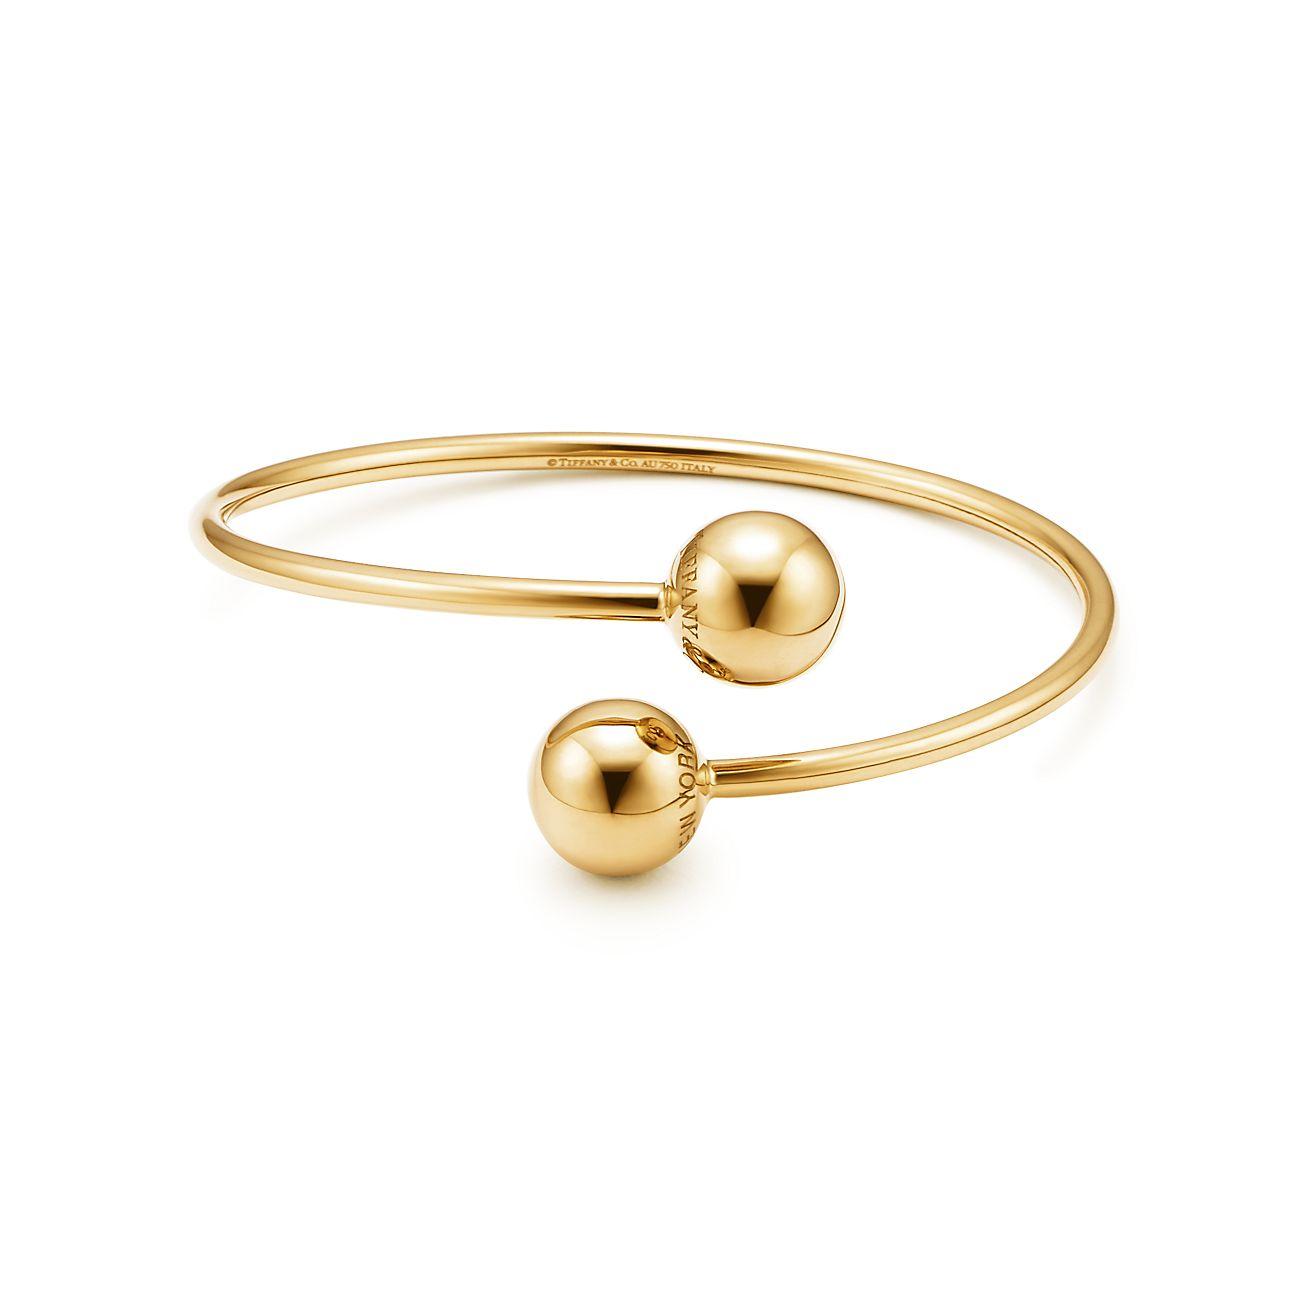 tiffany hardwear ball bypass bracelet in 18k gold medium tiffany